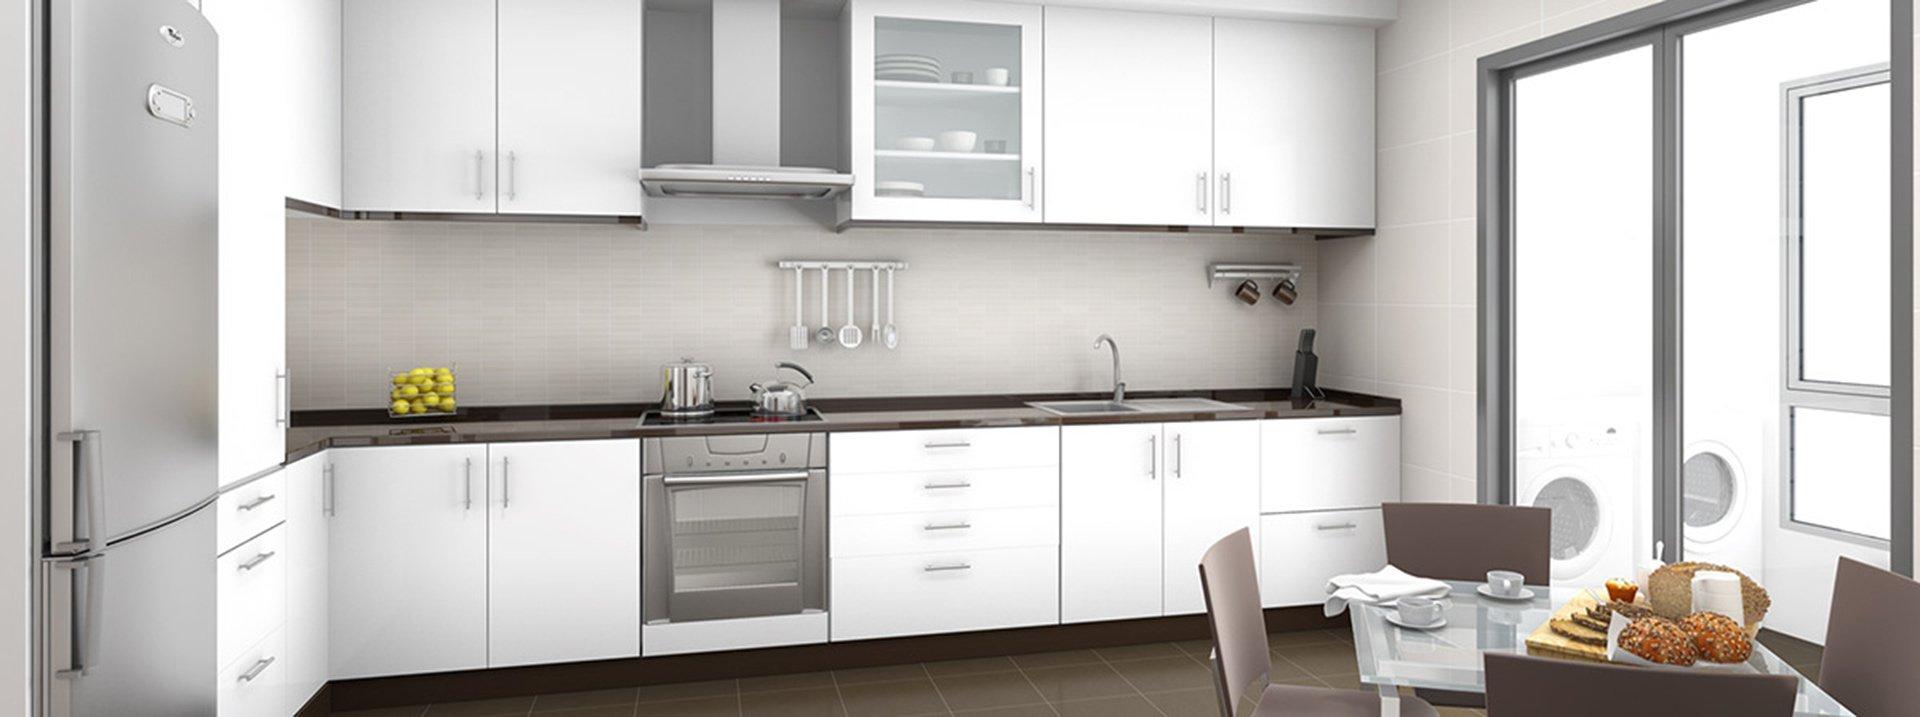 kitchen renovation contemporary kitchen